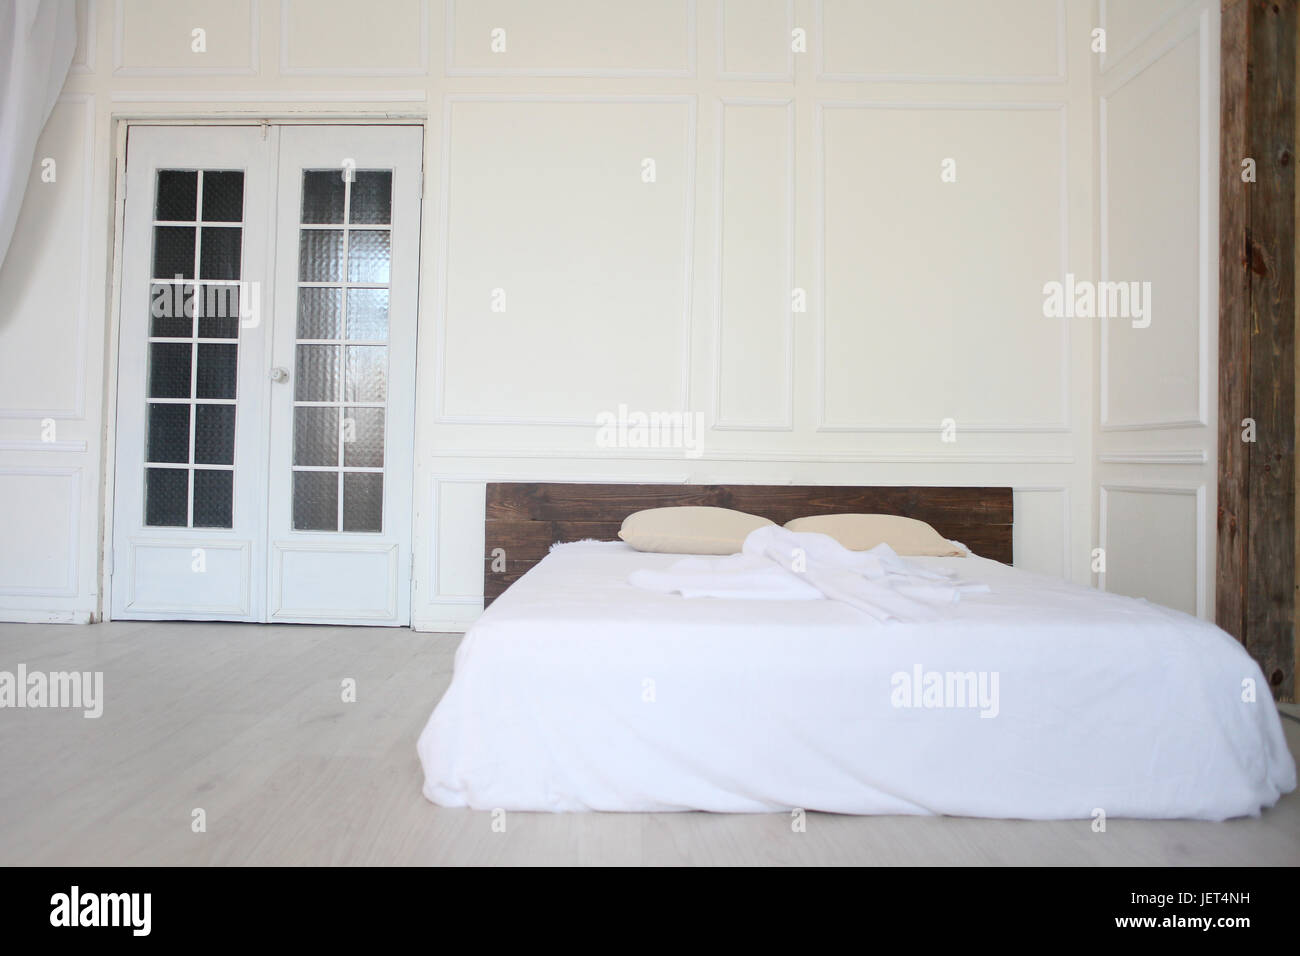 Used Bed Stockfotos & Used Bed Bilder - Seite 3 - Alamy